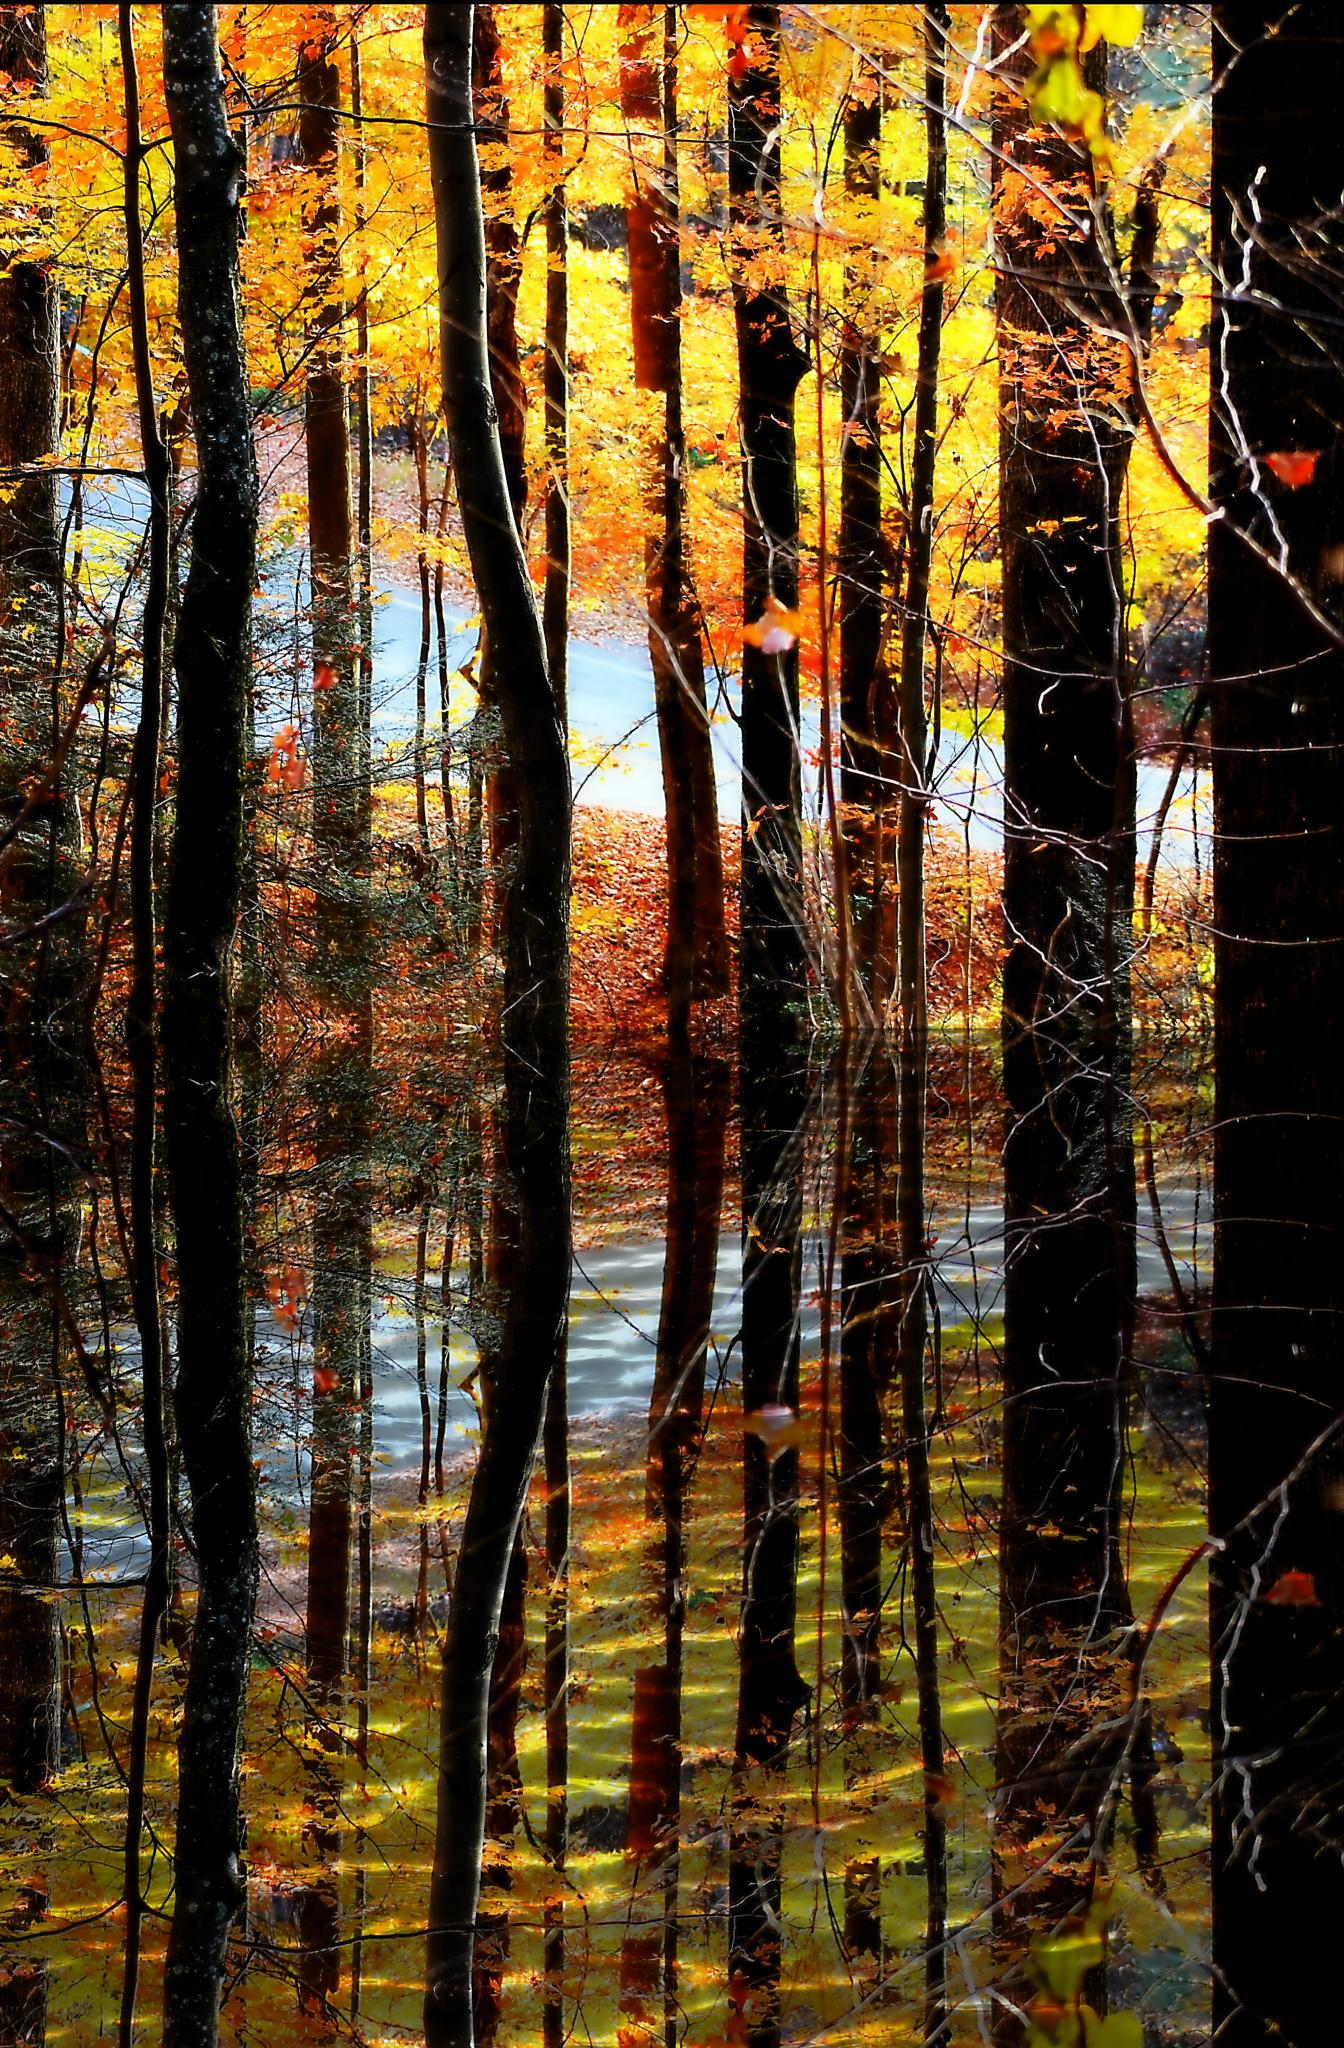 Forrest Reflections by darlenehoneycutt